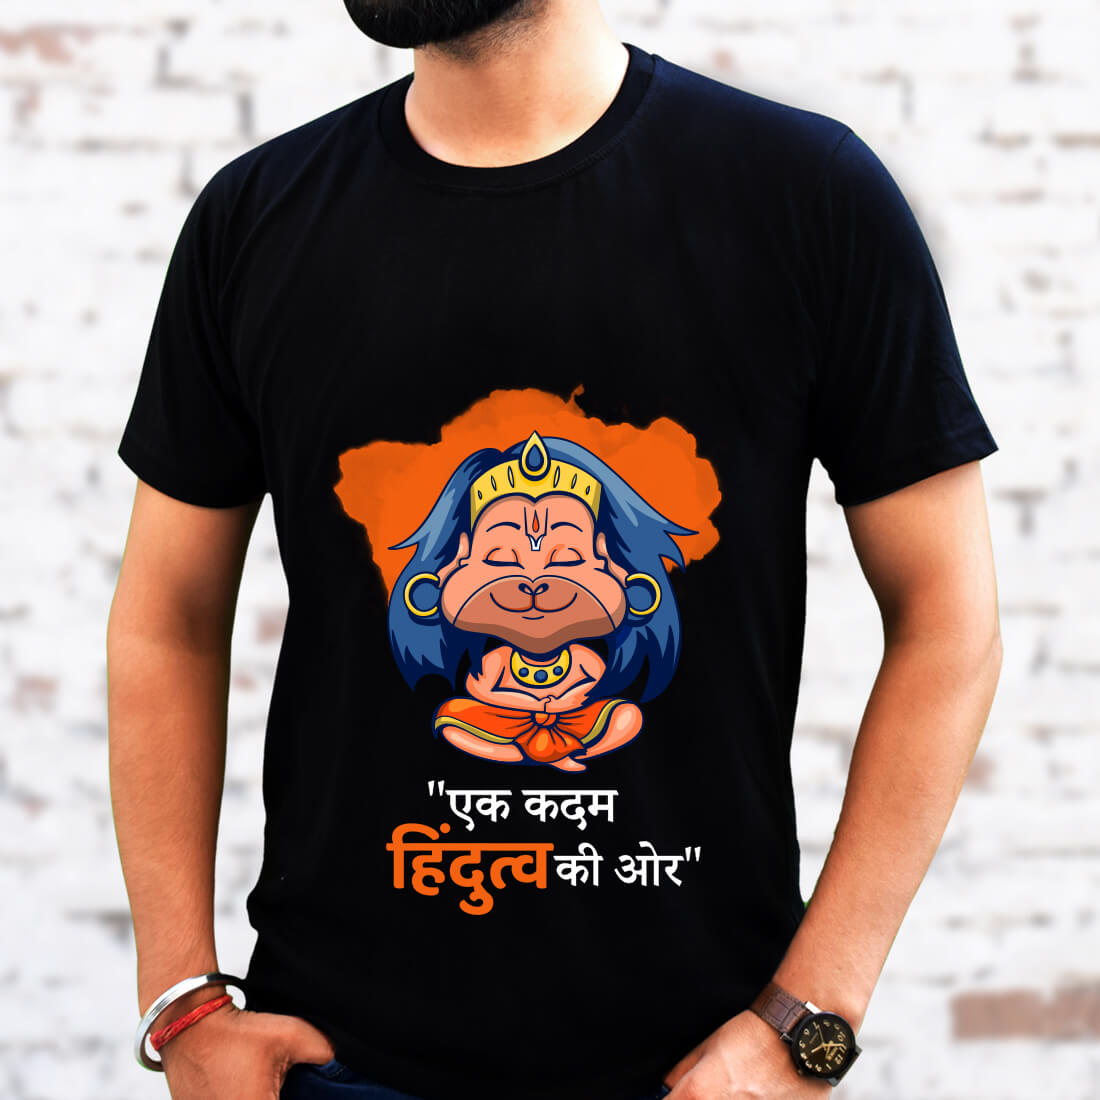 Quotes on Hindutva Printed Black Round Neck T Shirt